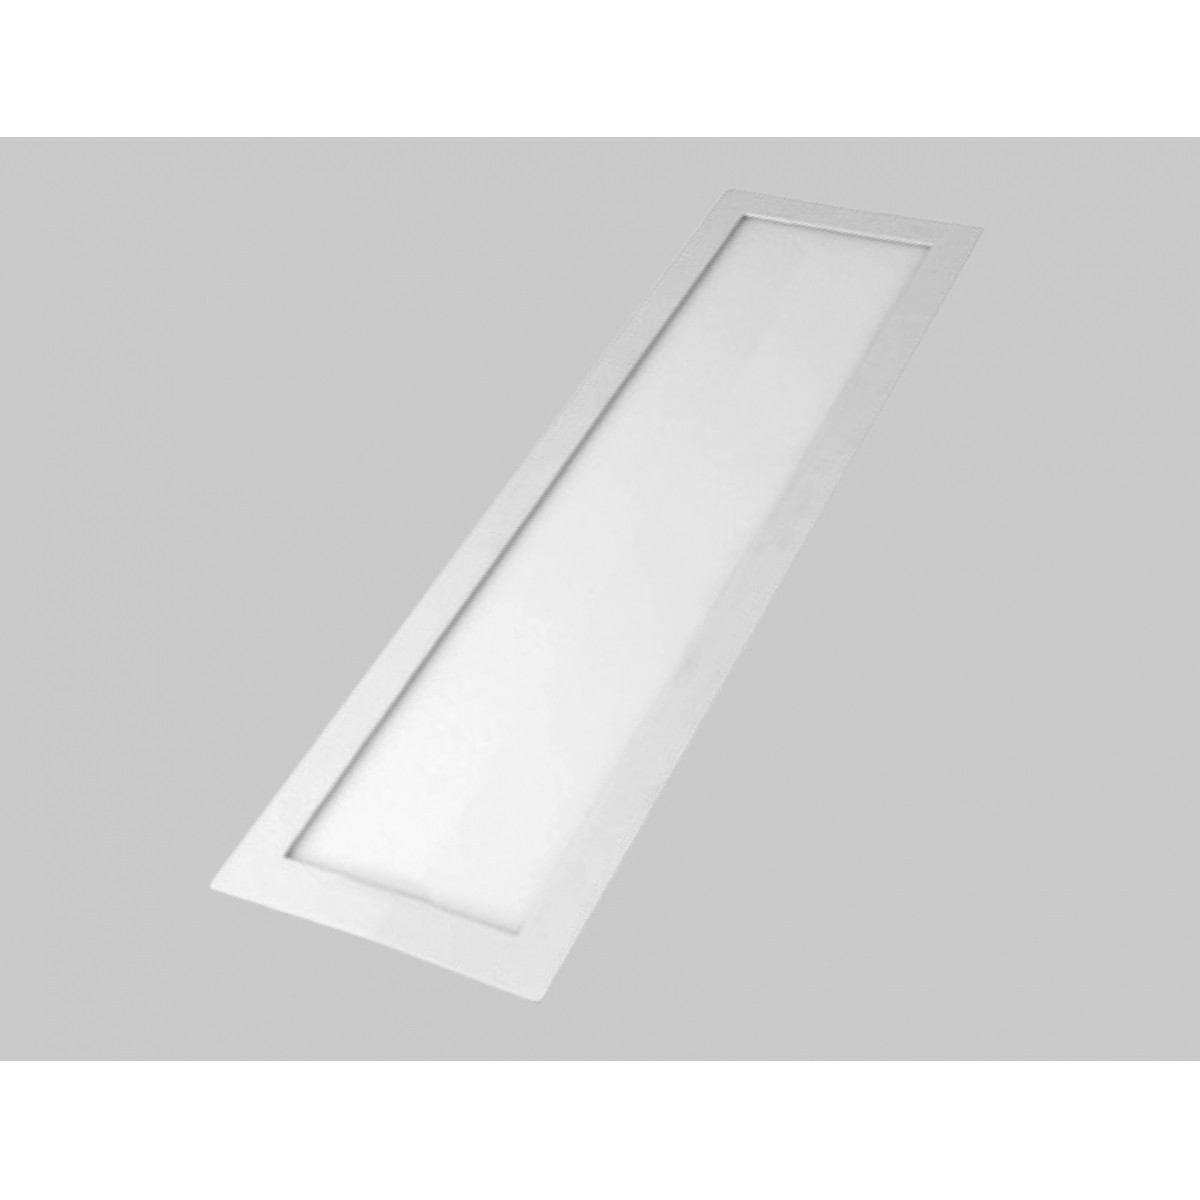 Plafon LED 36W Embutir Retangular 30X60 3000K DL125WW Bella